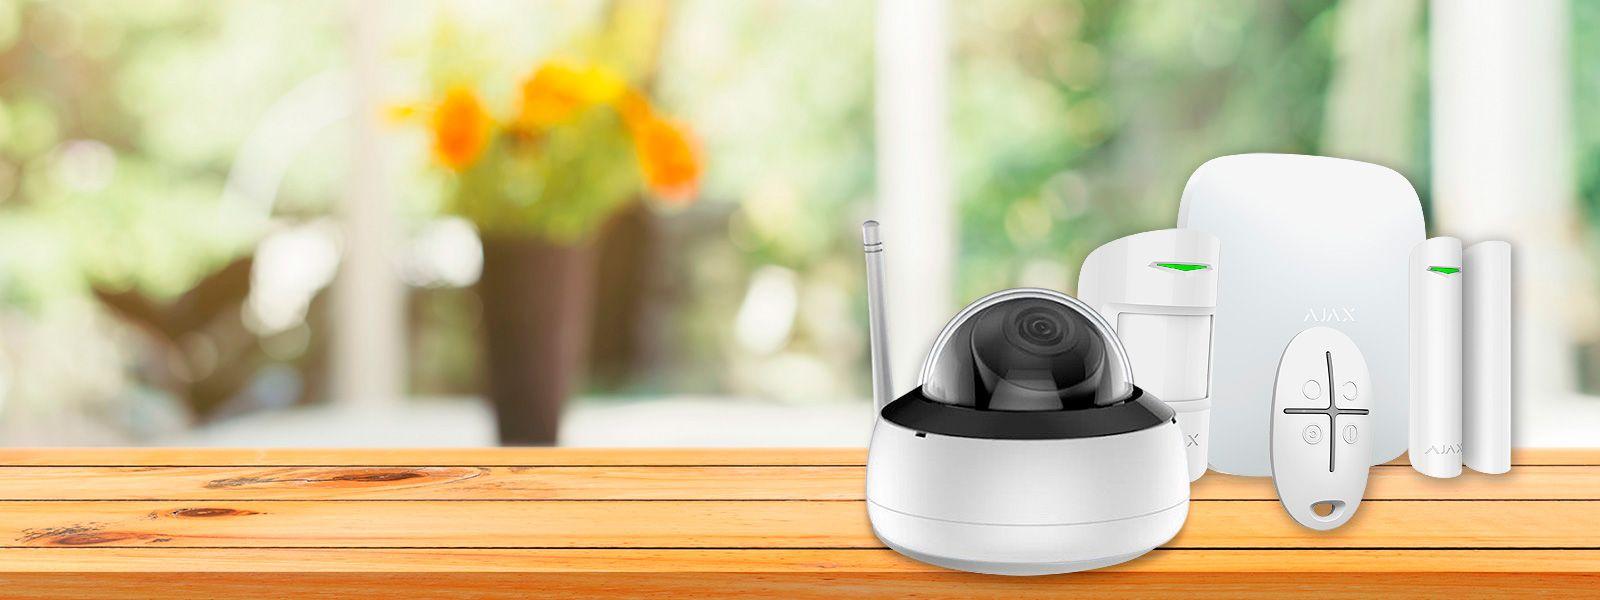 Kit AJAX de alarma inalámbrica con cámara WIFI grabadora